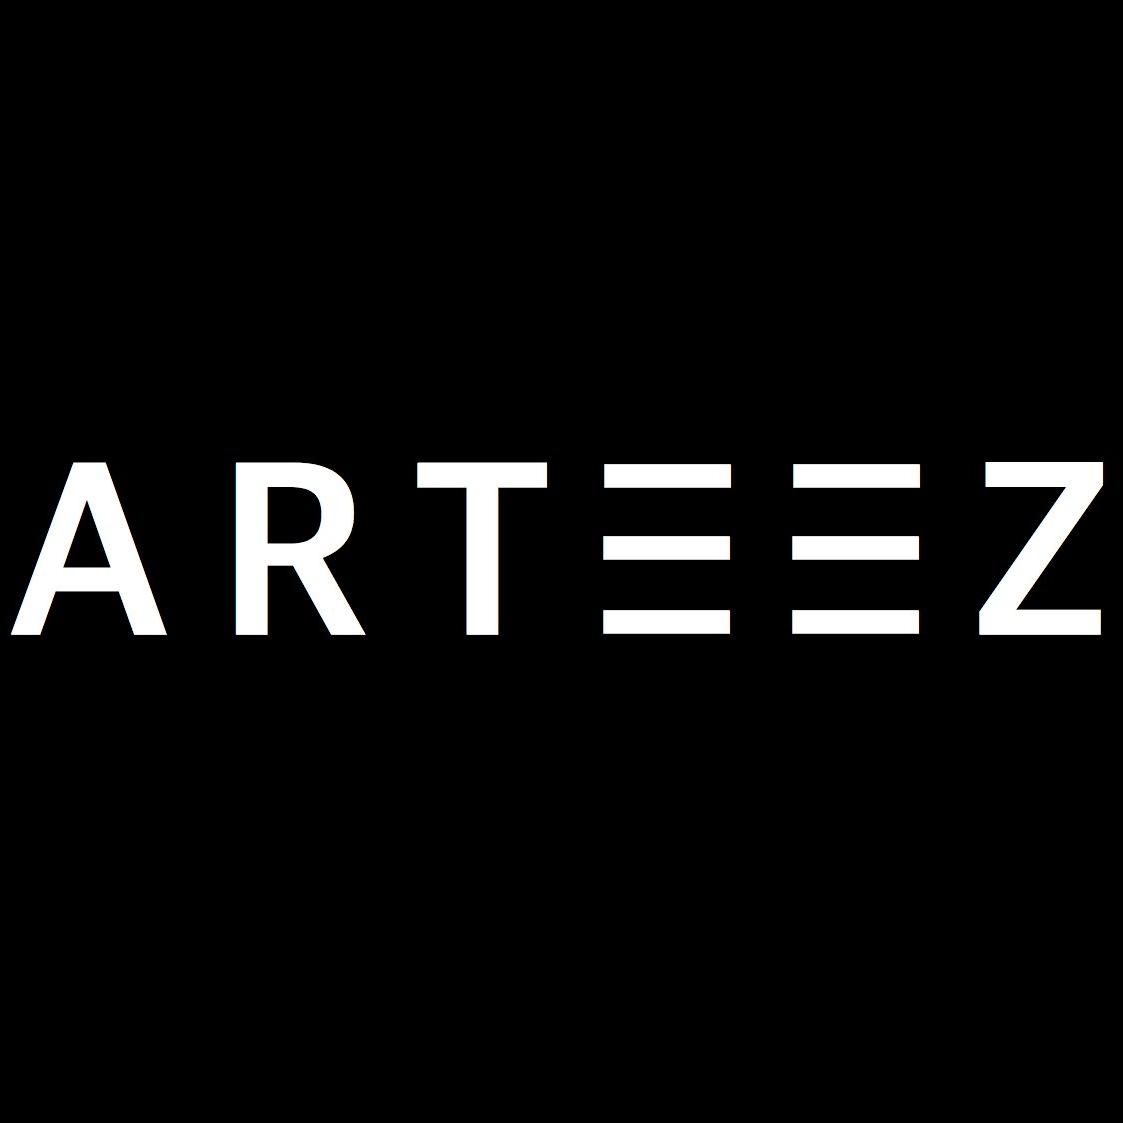 cropped-Cover_Facebook_Arteez